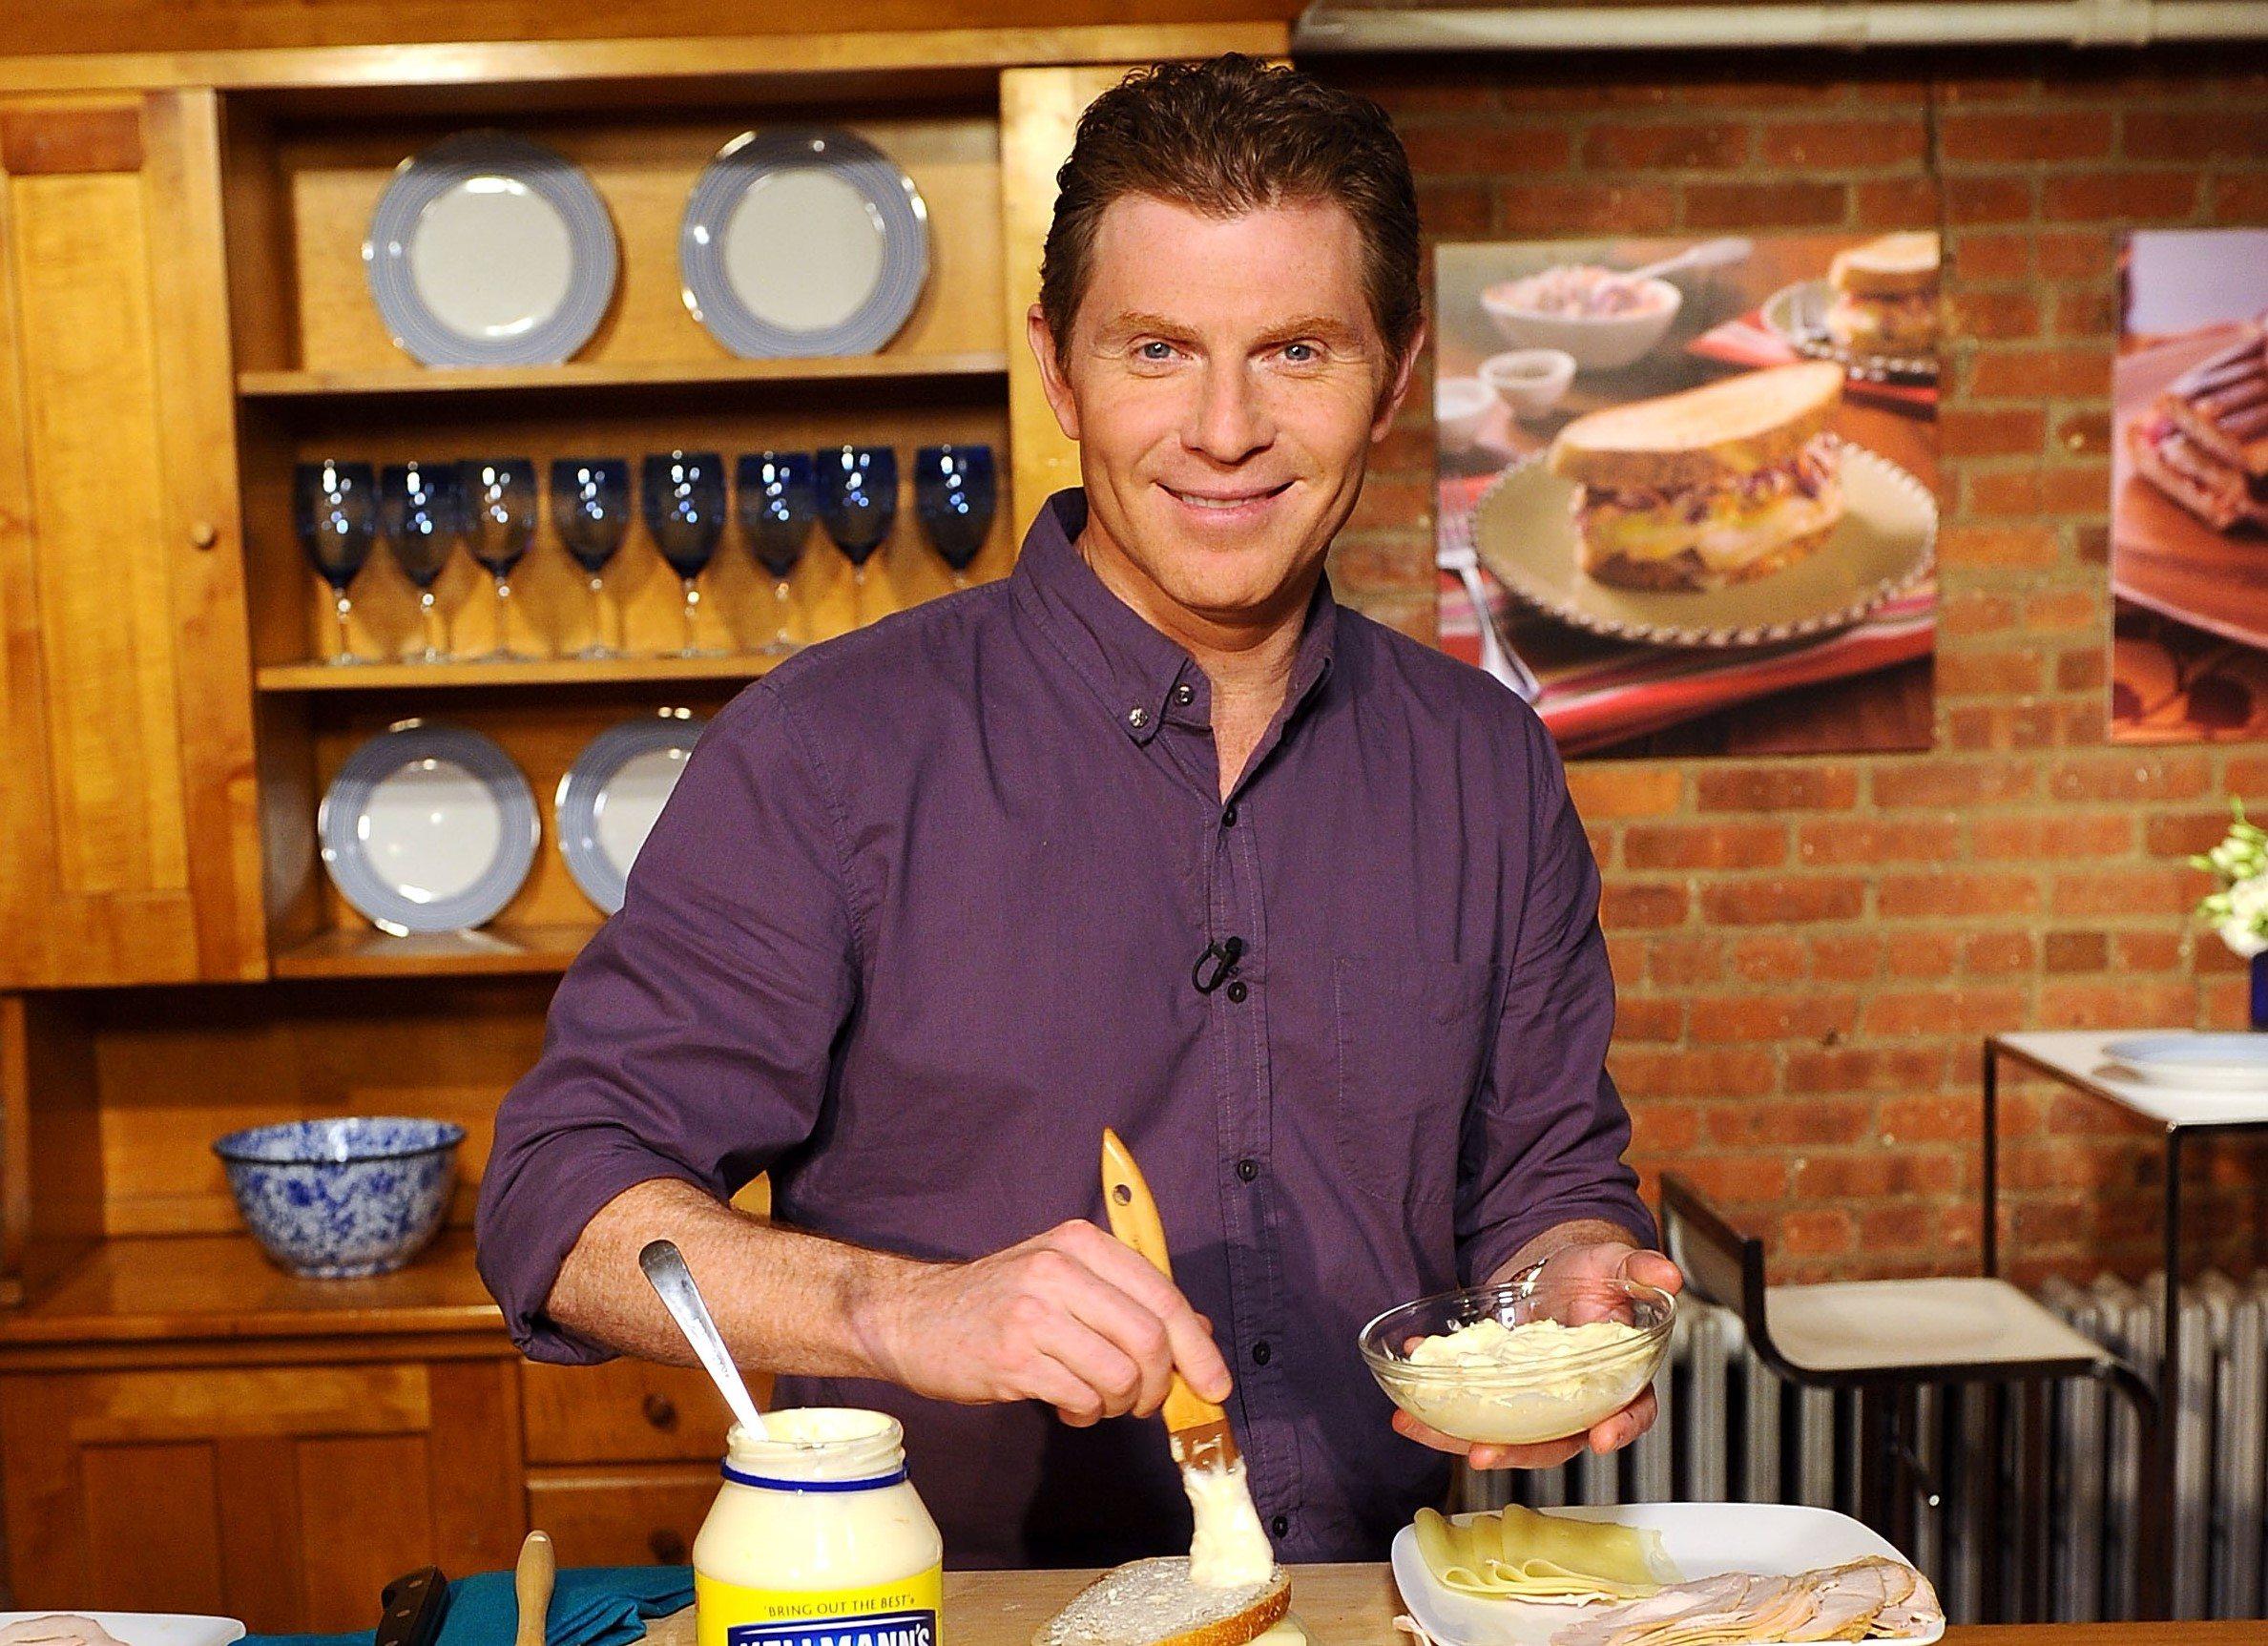 Bobby Flay - Restaurants, TV Shows & Family - Biography